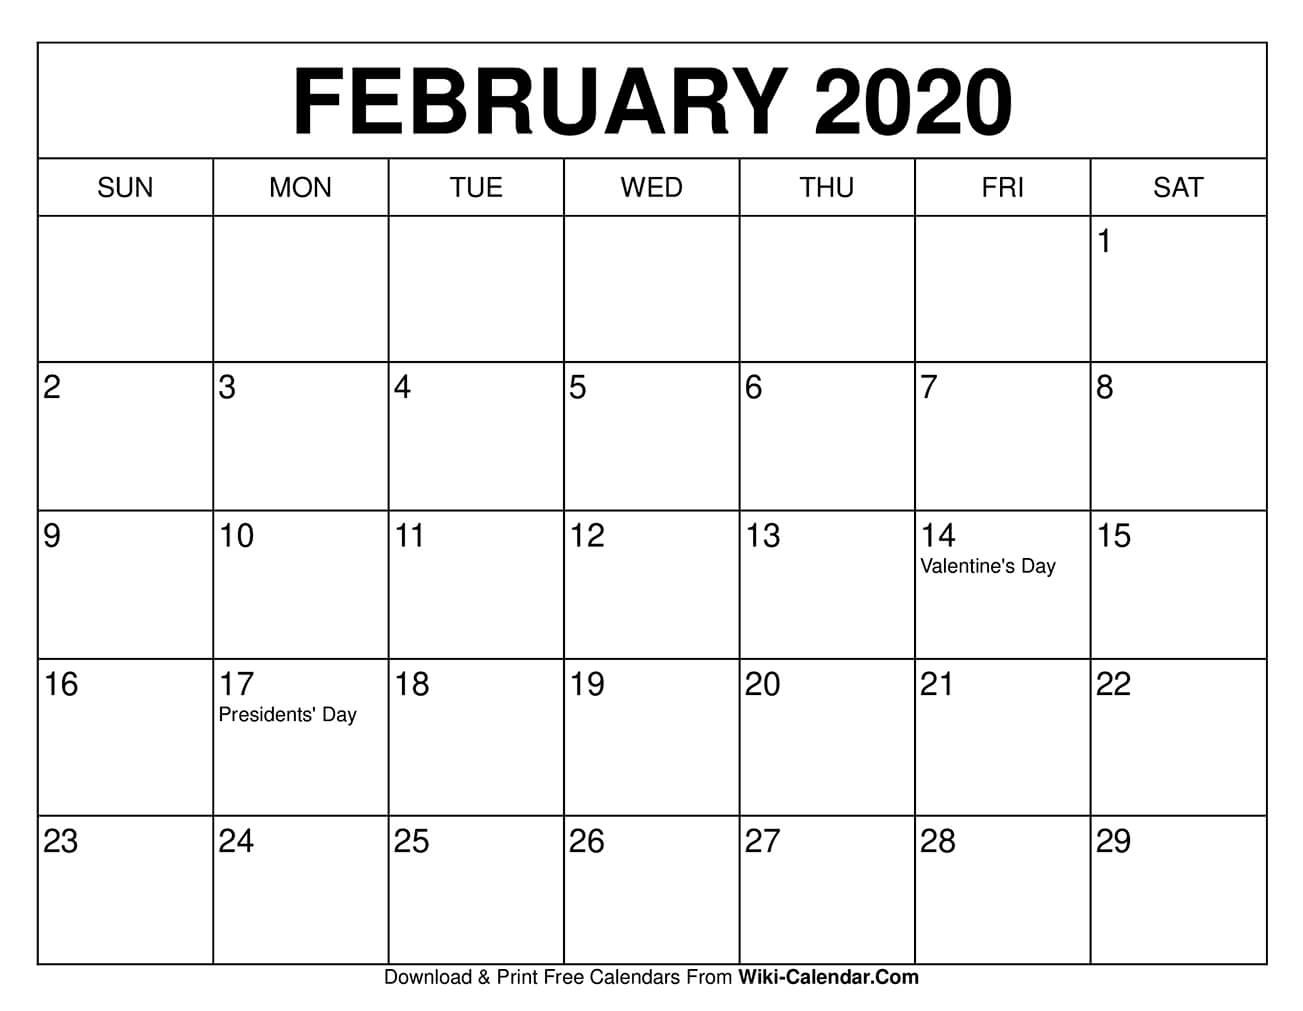 Free Printable February 2020 Calendars  Printable February 2020 Calendar Page